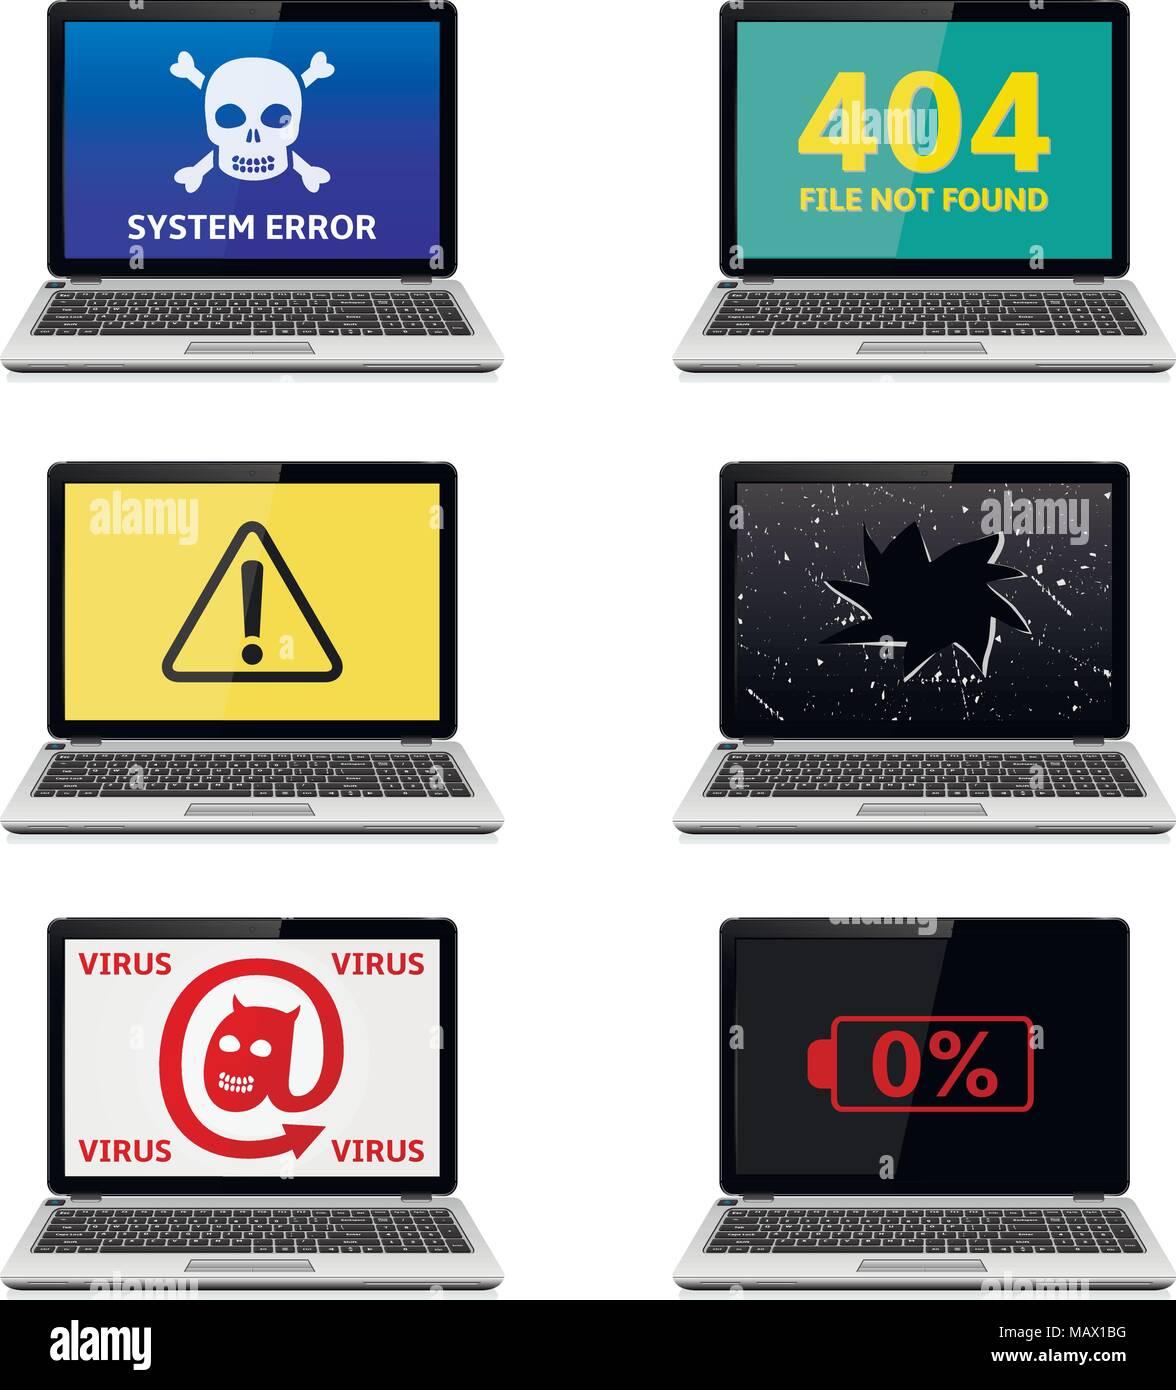 Error Laptops Icons Set - Stock Image